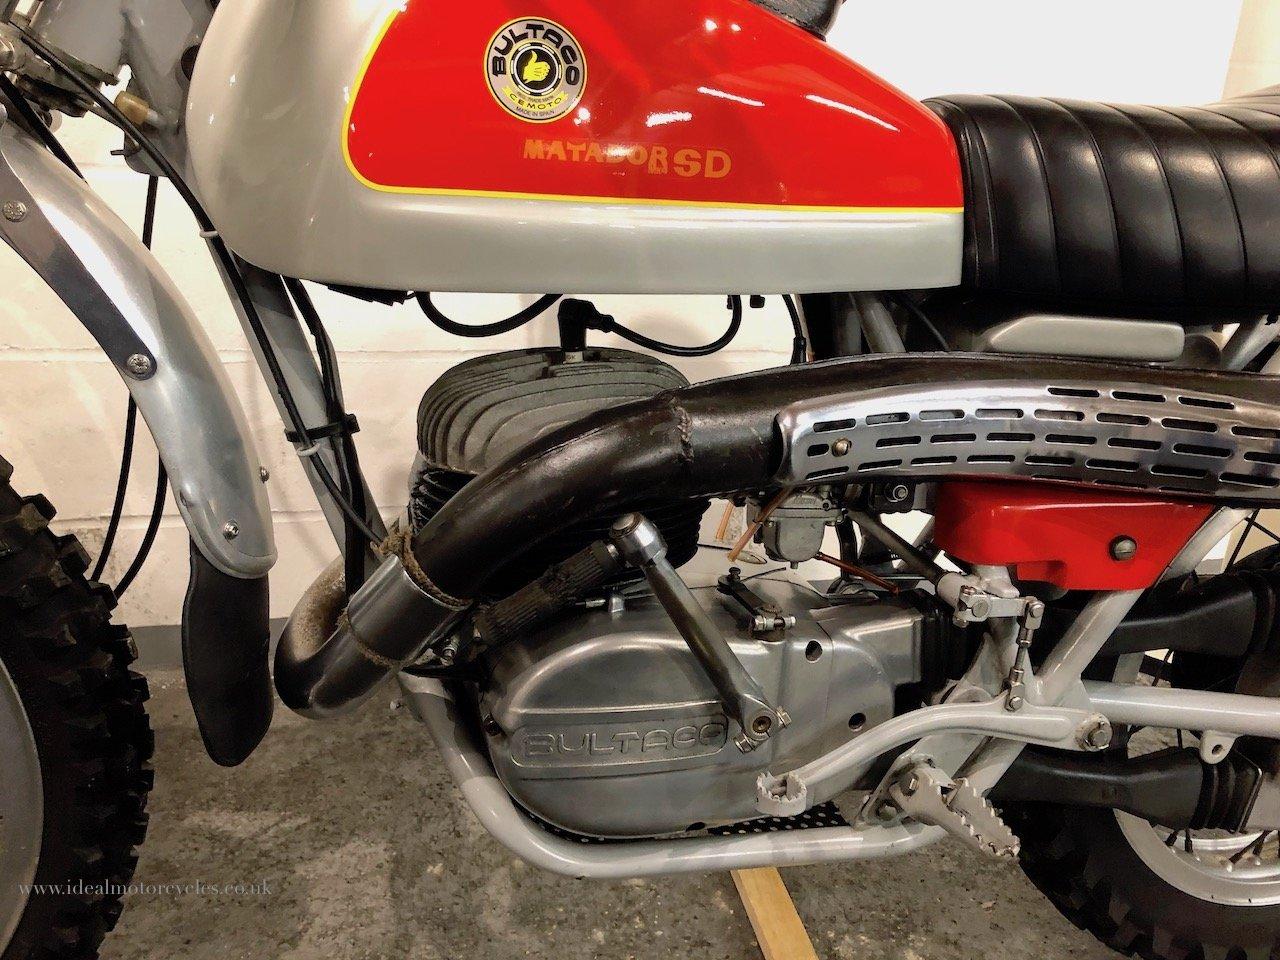 1973 Bultaco Matador Mk4 250cc Enduro Motorcycle For Sale (picture 6 of 6)